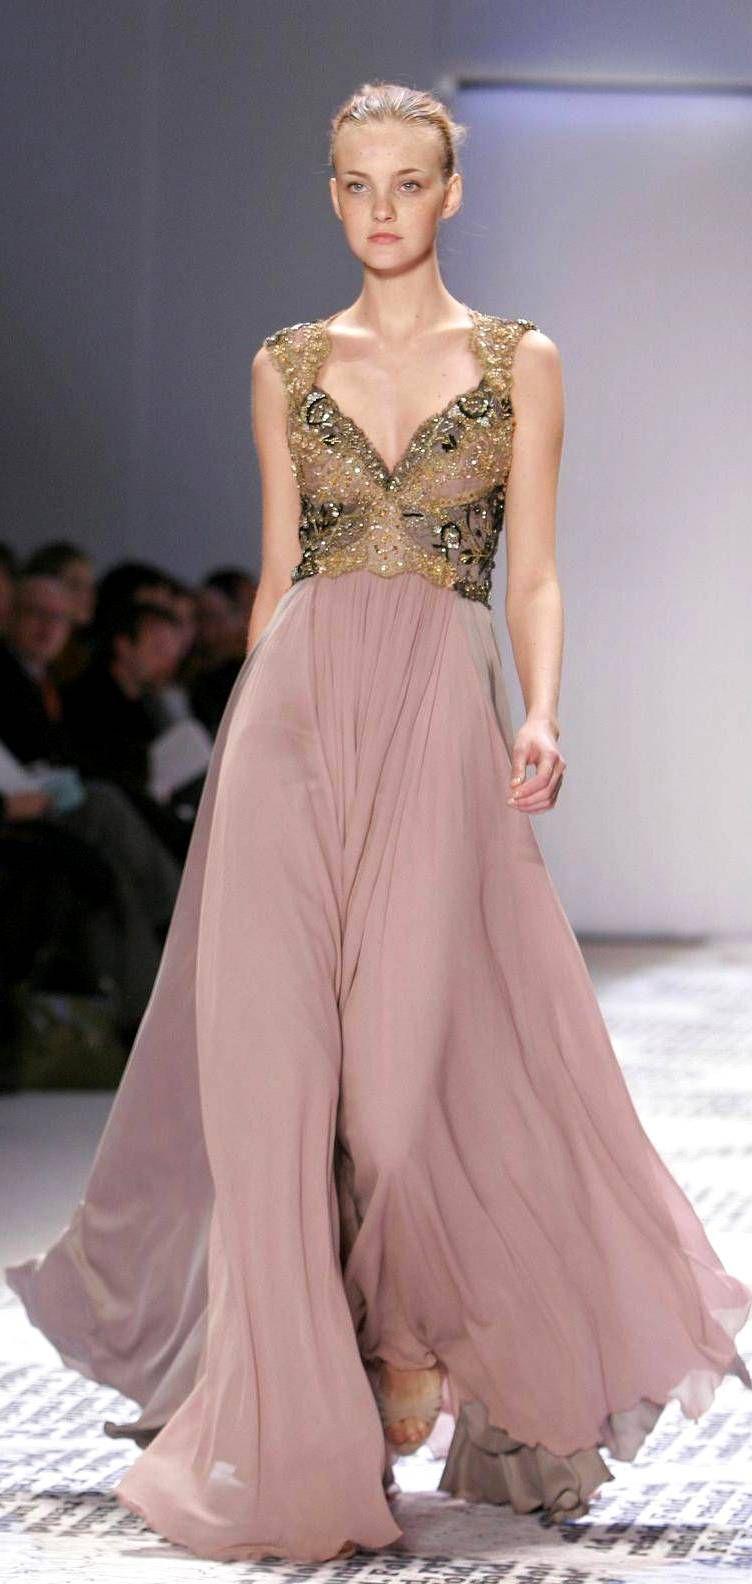 Pin de Courtney Maxfield en runway worthy | Pinterest | Vestidos ...